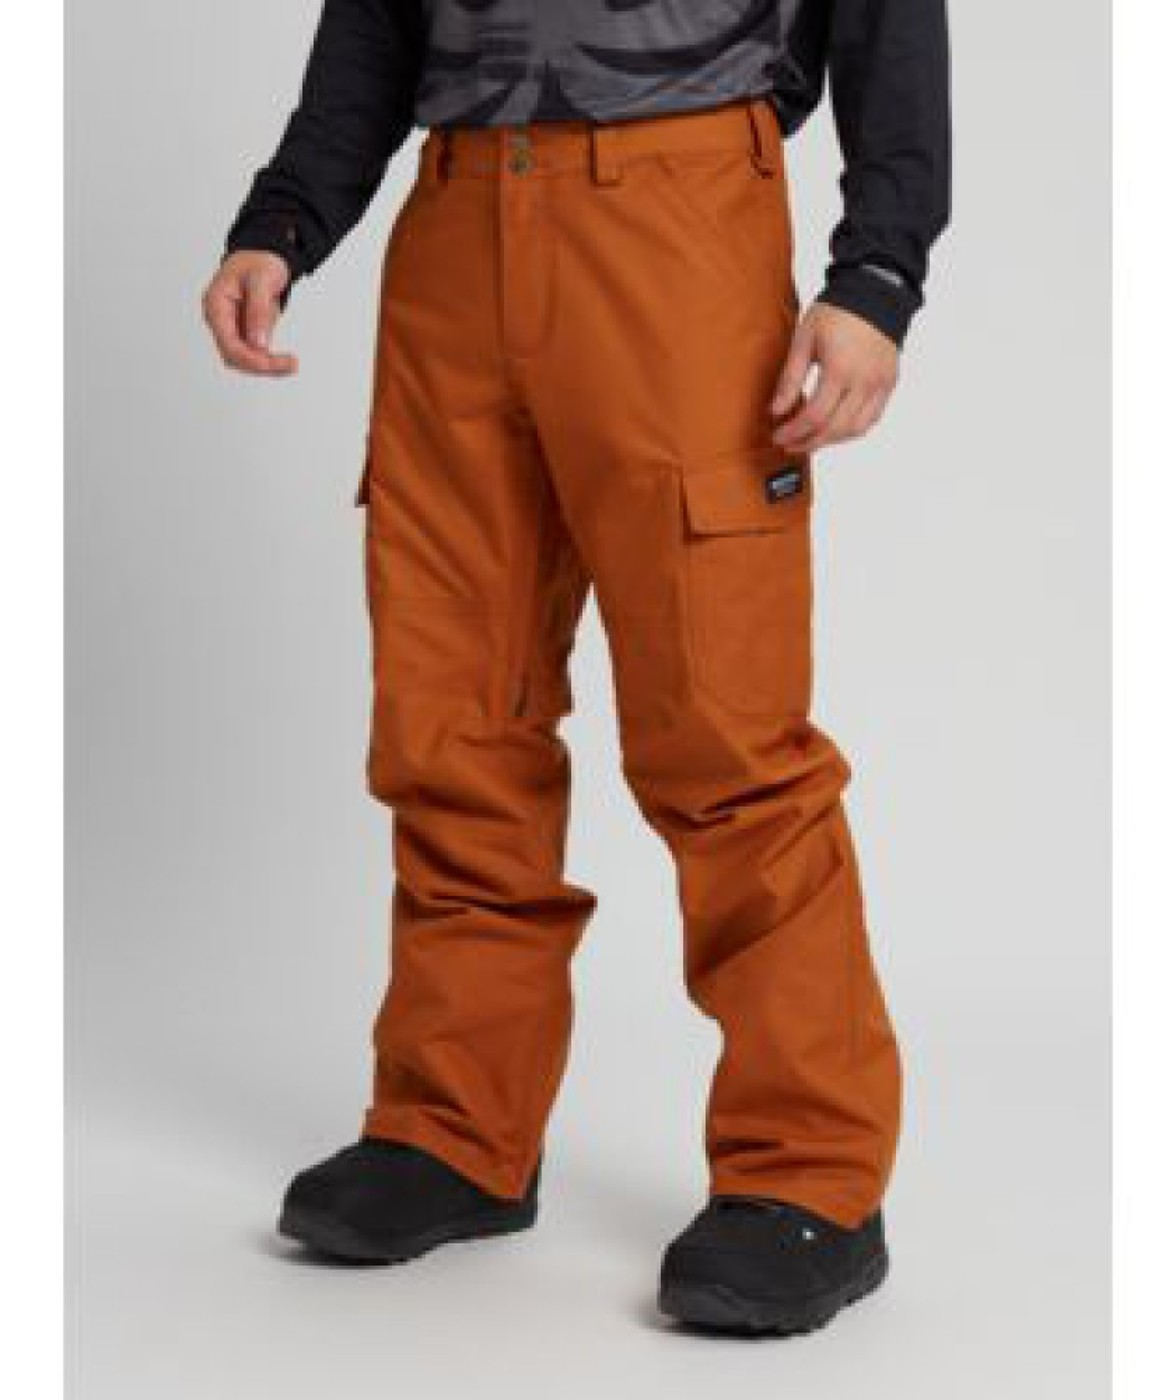 BURTON Cargo Pant Regular Fit - Herren